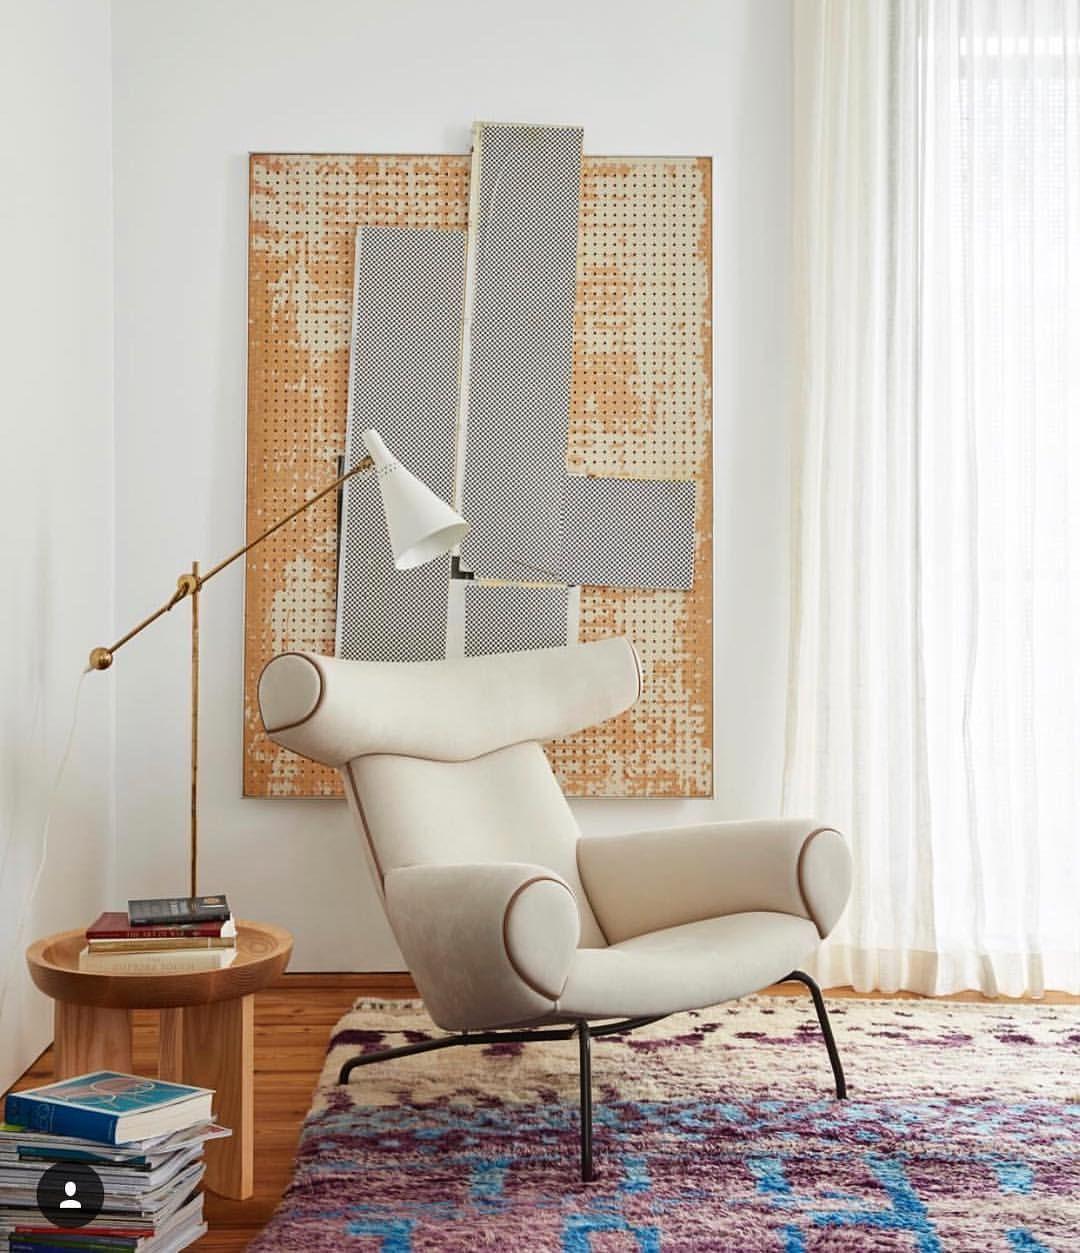 Modern Interior Design Magazine: @Jamiebushco Creates A Beautiful Warm Tone With Our Ox